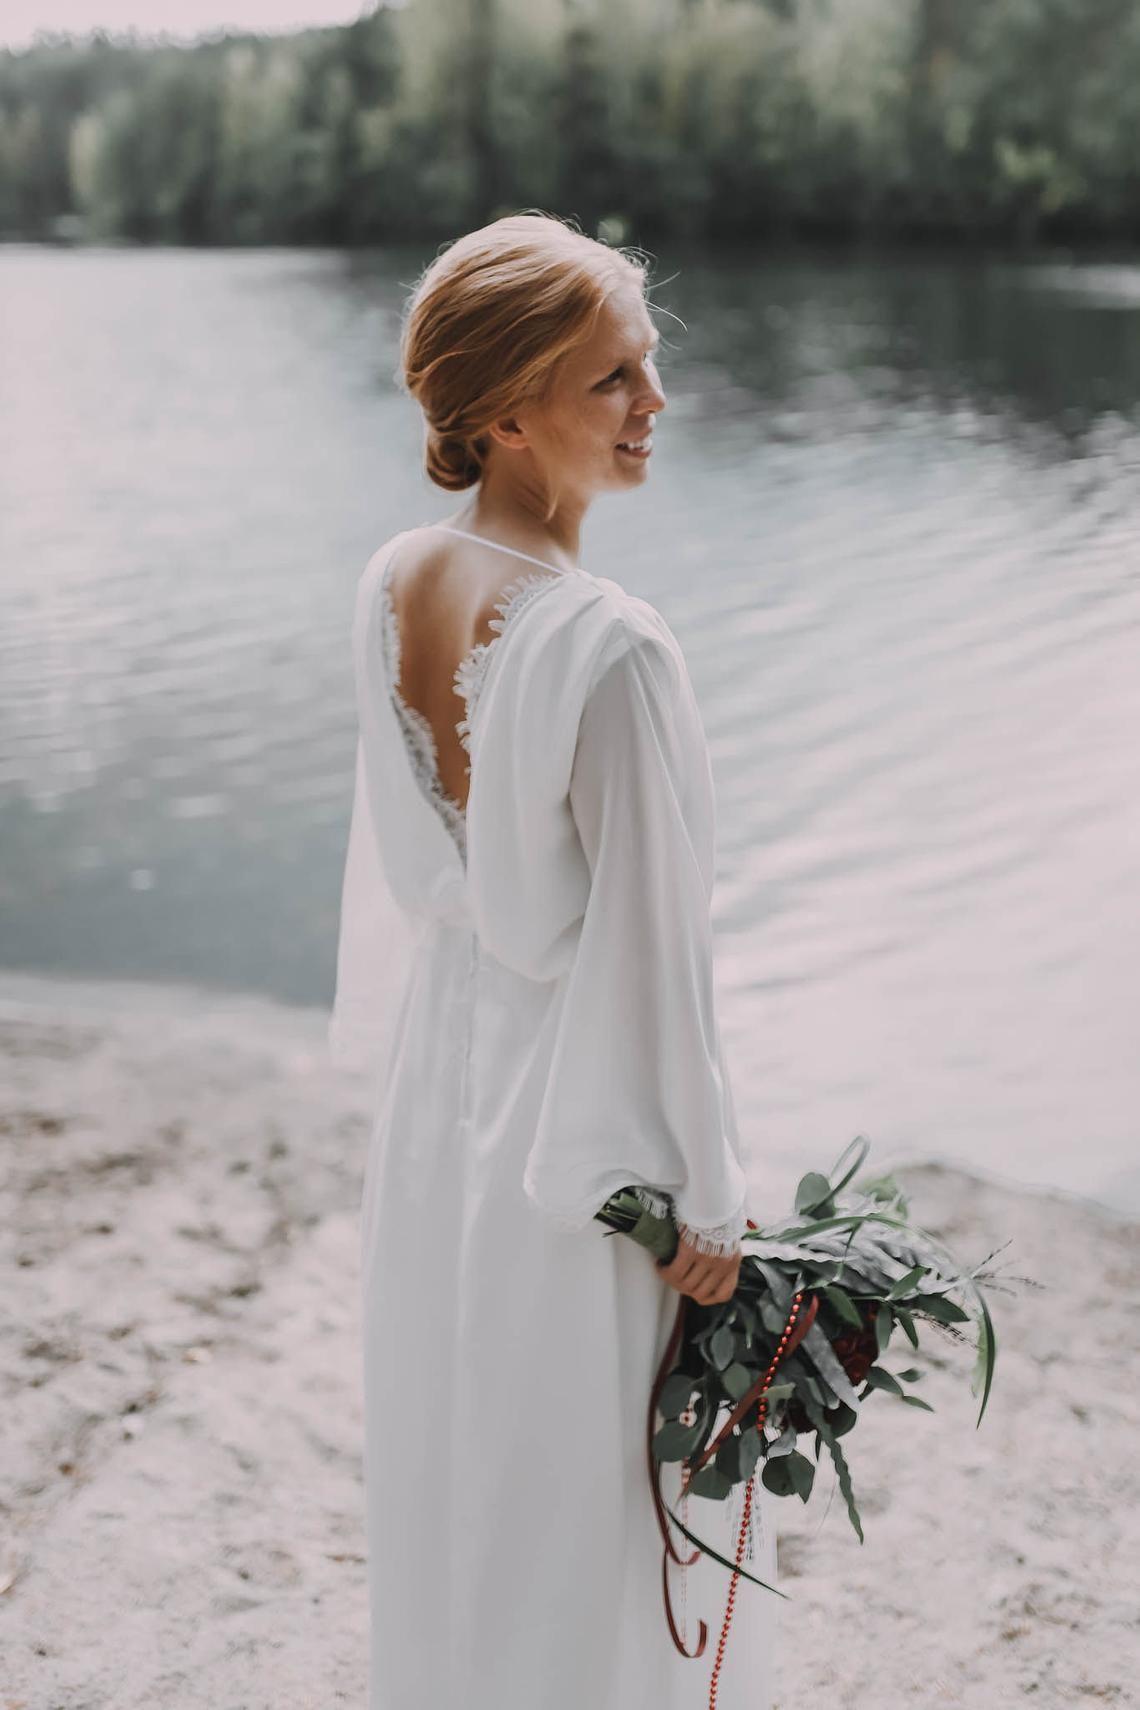 Long Sleeve Bohemian Wedding Dress Open Back Wedding Dress Boho Wedding Dress Simple Wedding Dress Wedding Dress Vintage Wedding Dress Long Sleeve Bohemian Wedding Dress Open Back Wedding Dress Bohemian Wedding